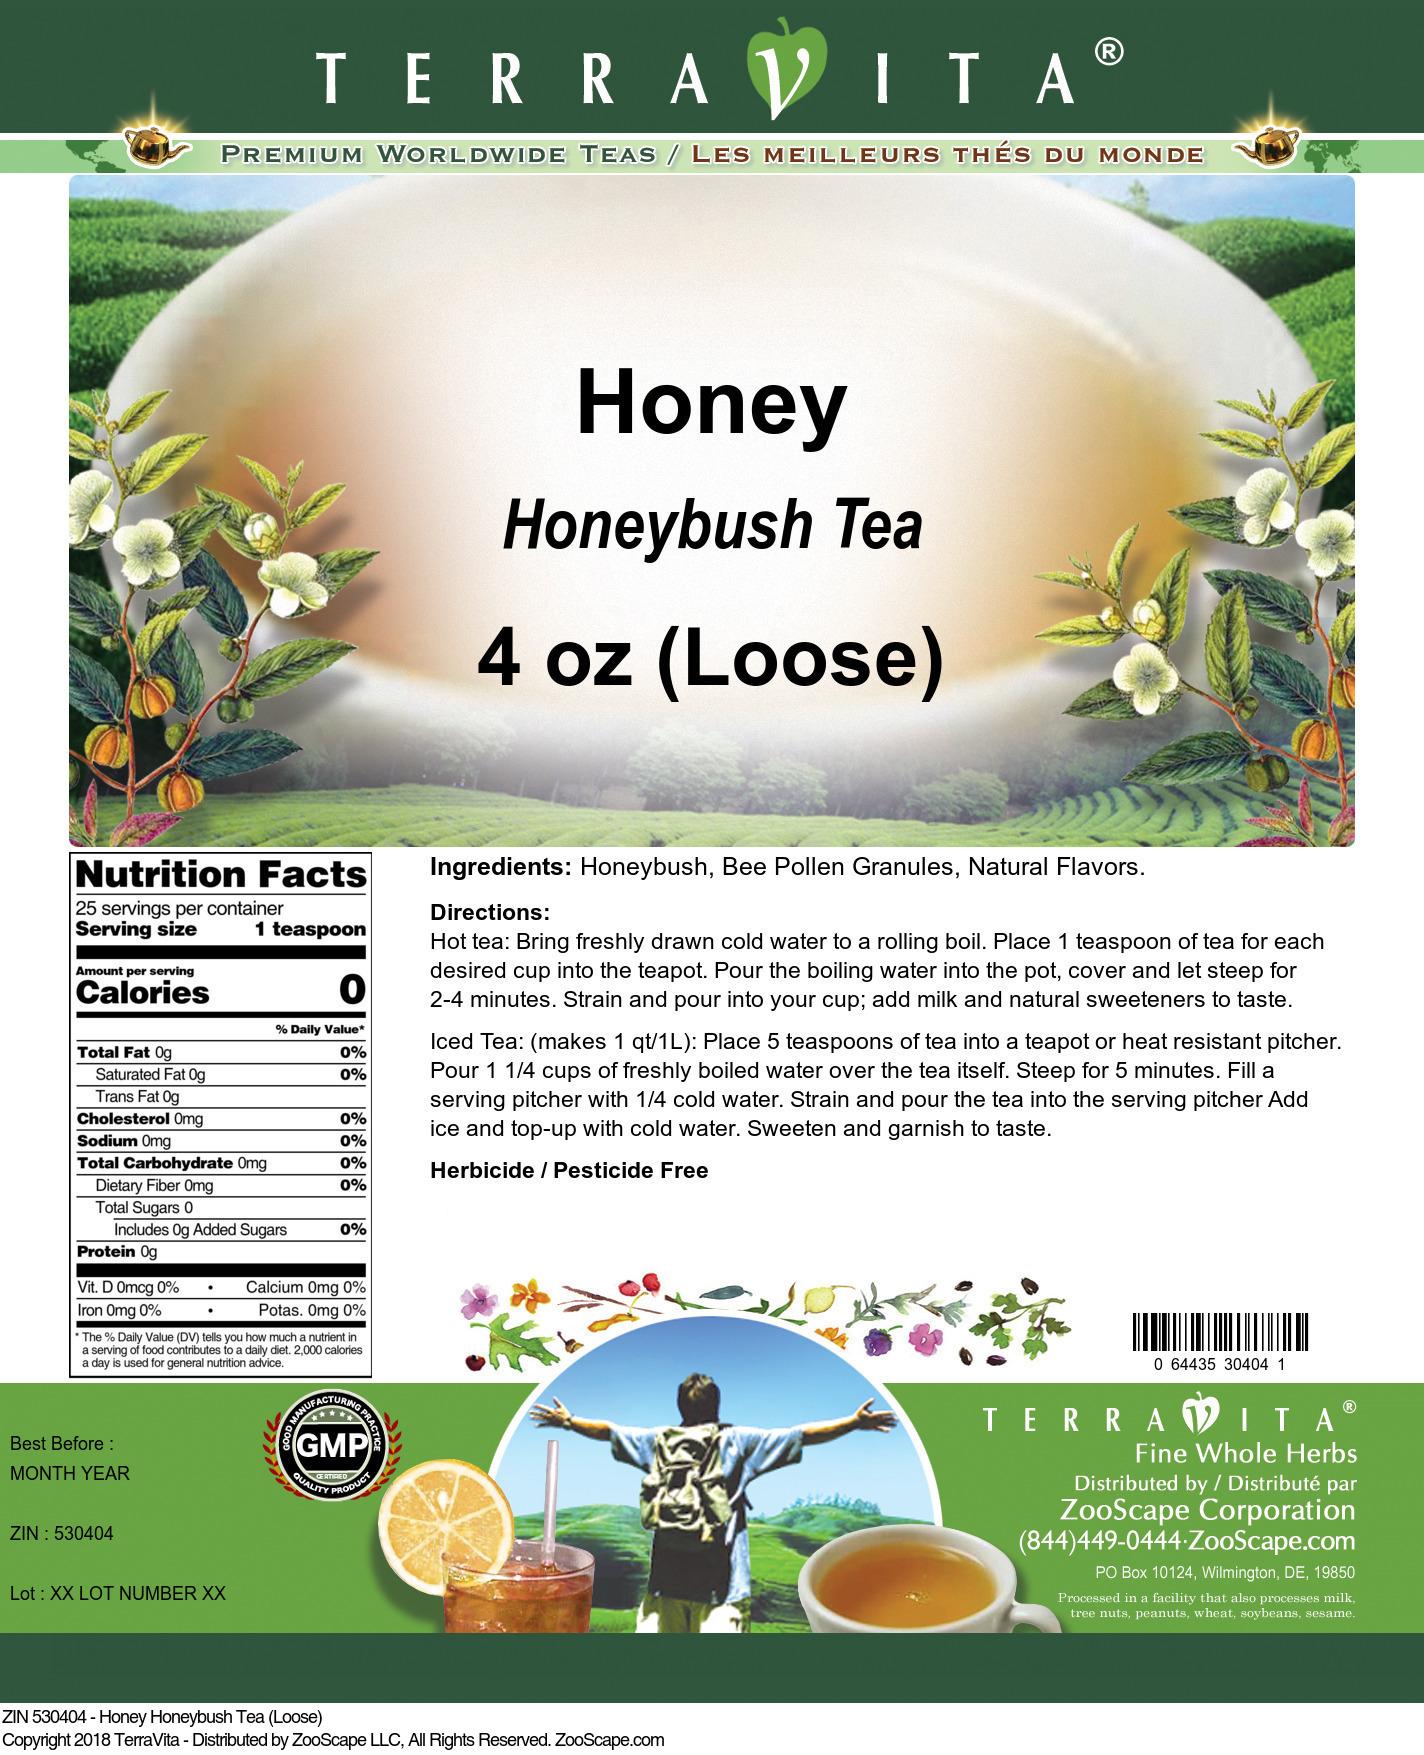 Honey Honeybush Tea